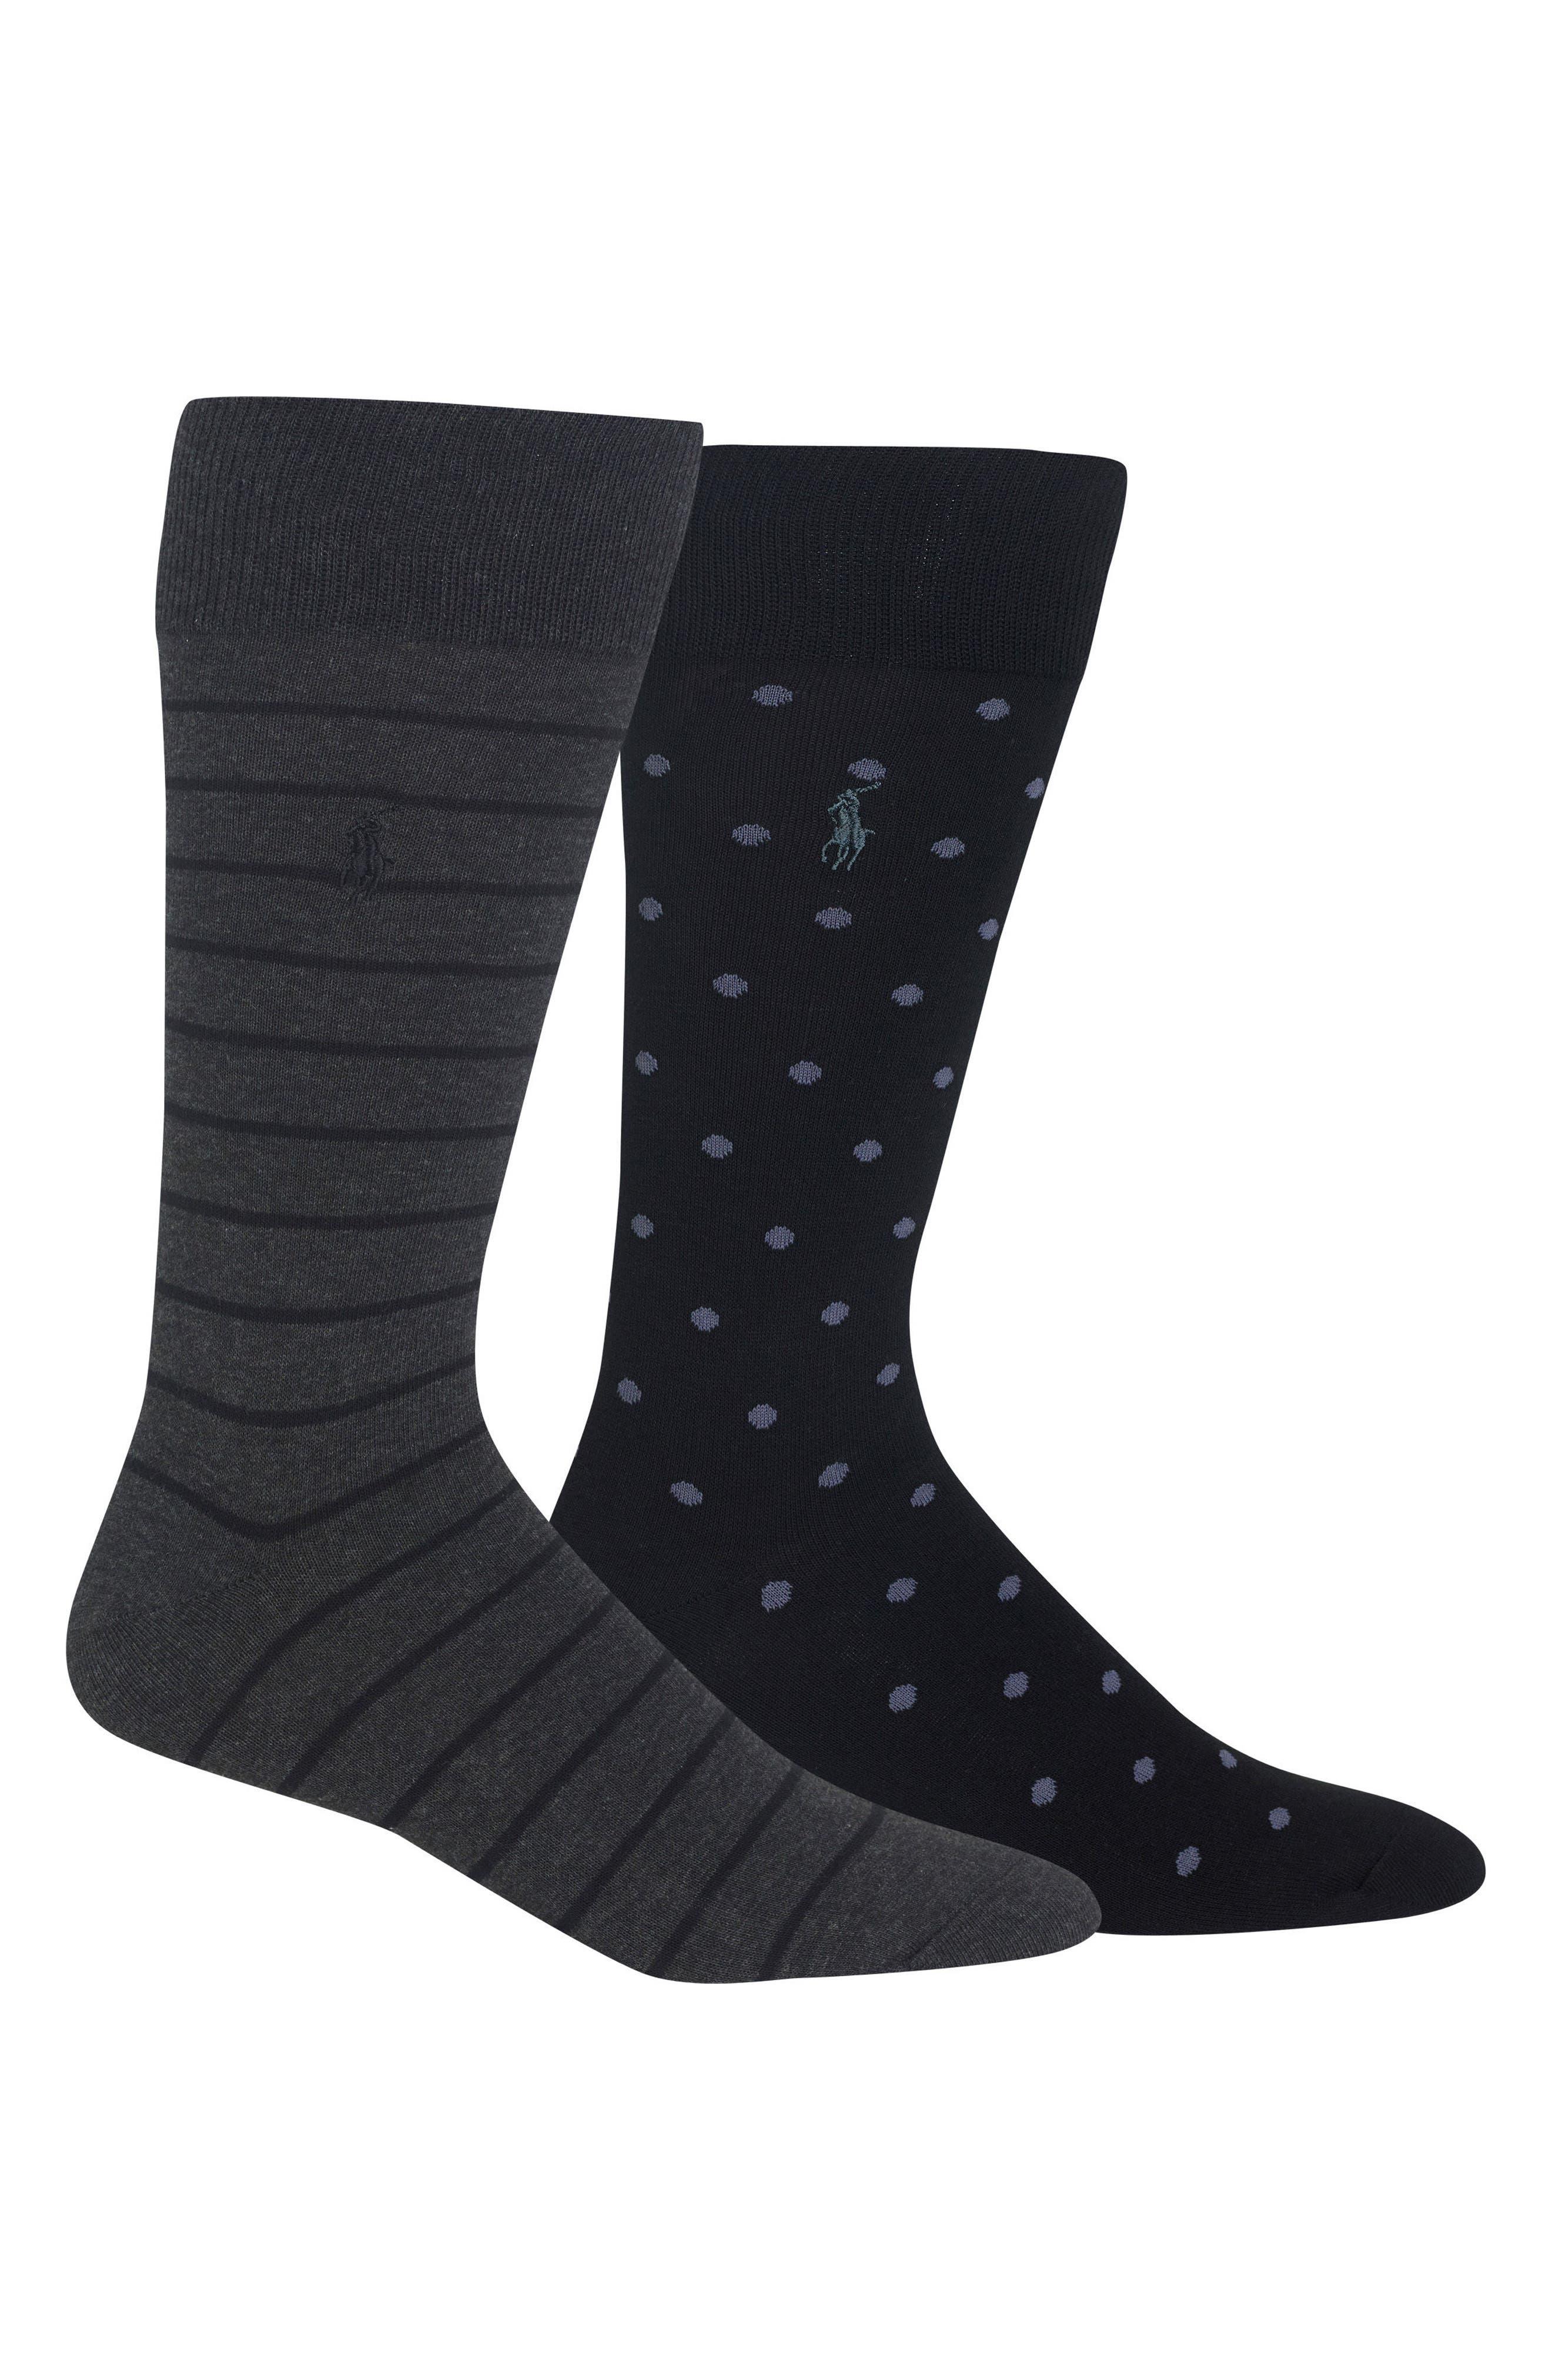 2-Pack Socks,                             Main thumbnail 1, color,                             011